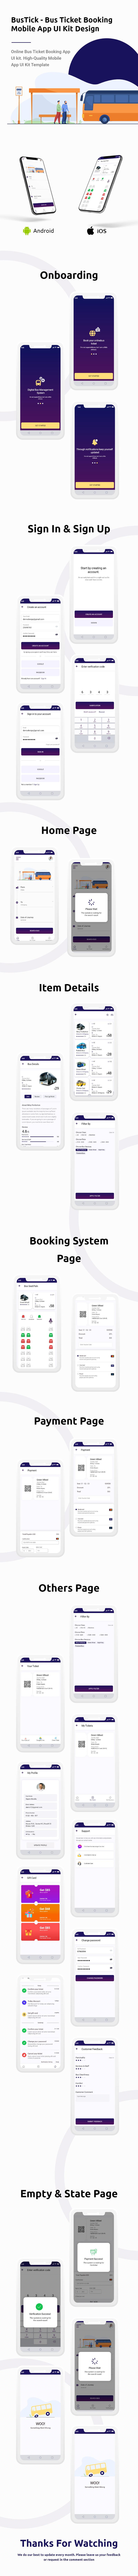 BusTick - Bus Booking Mobile UI Design - 2